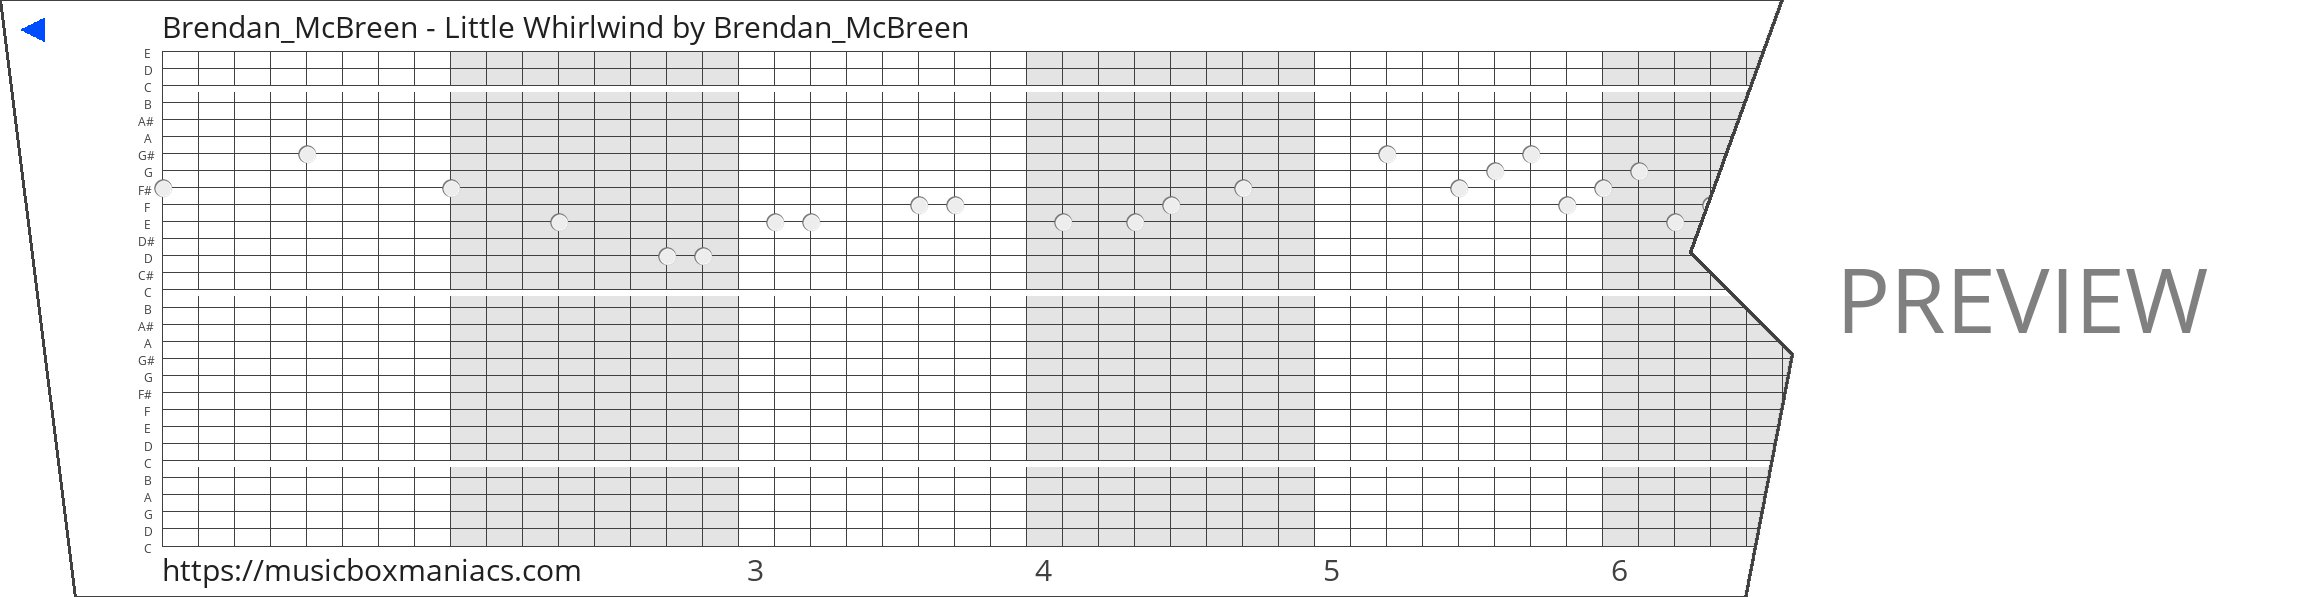 Brendan_McBreen - Little Whirlwind 30 note music box paper strip